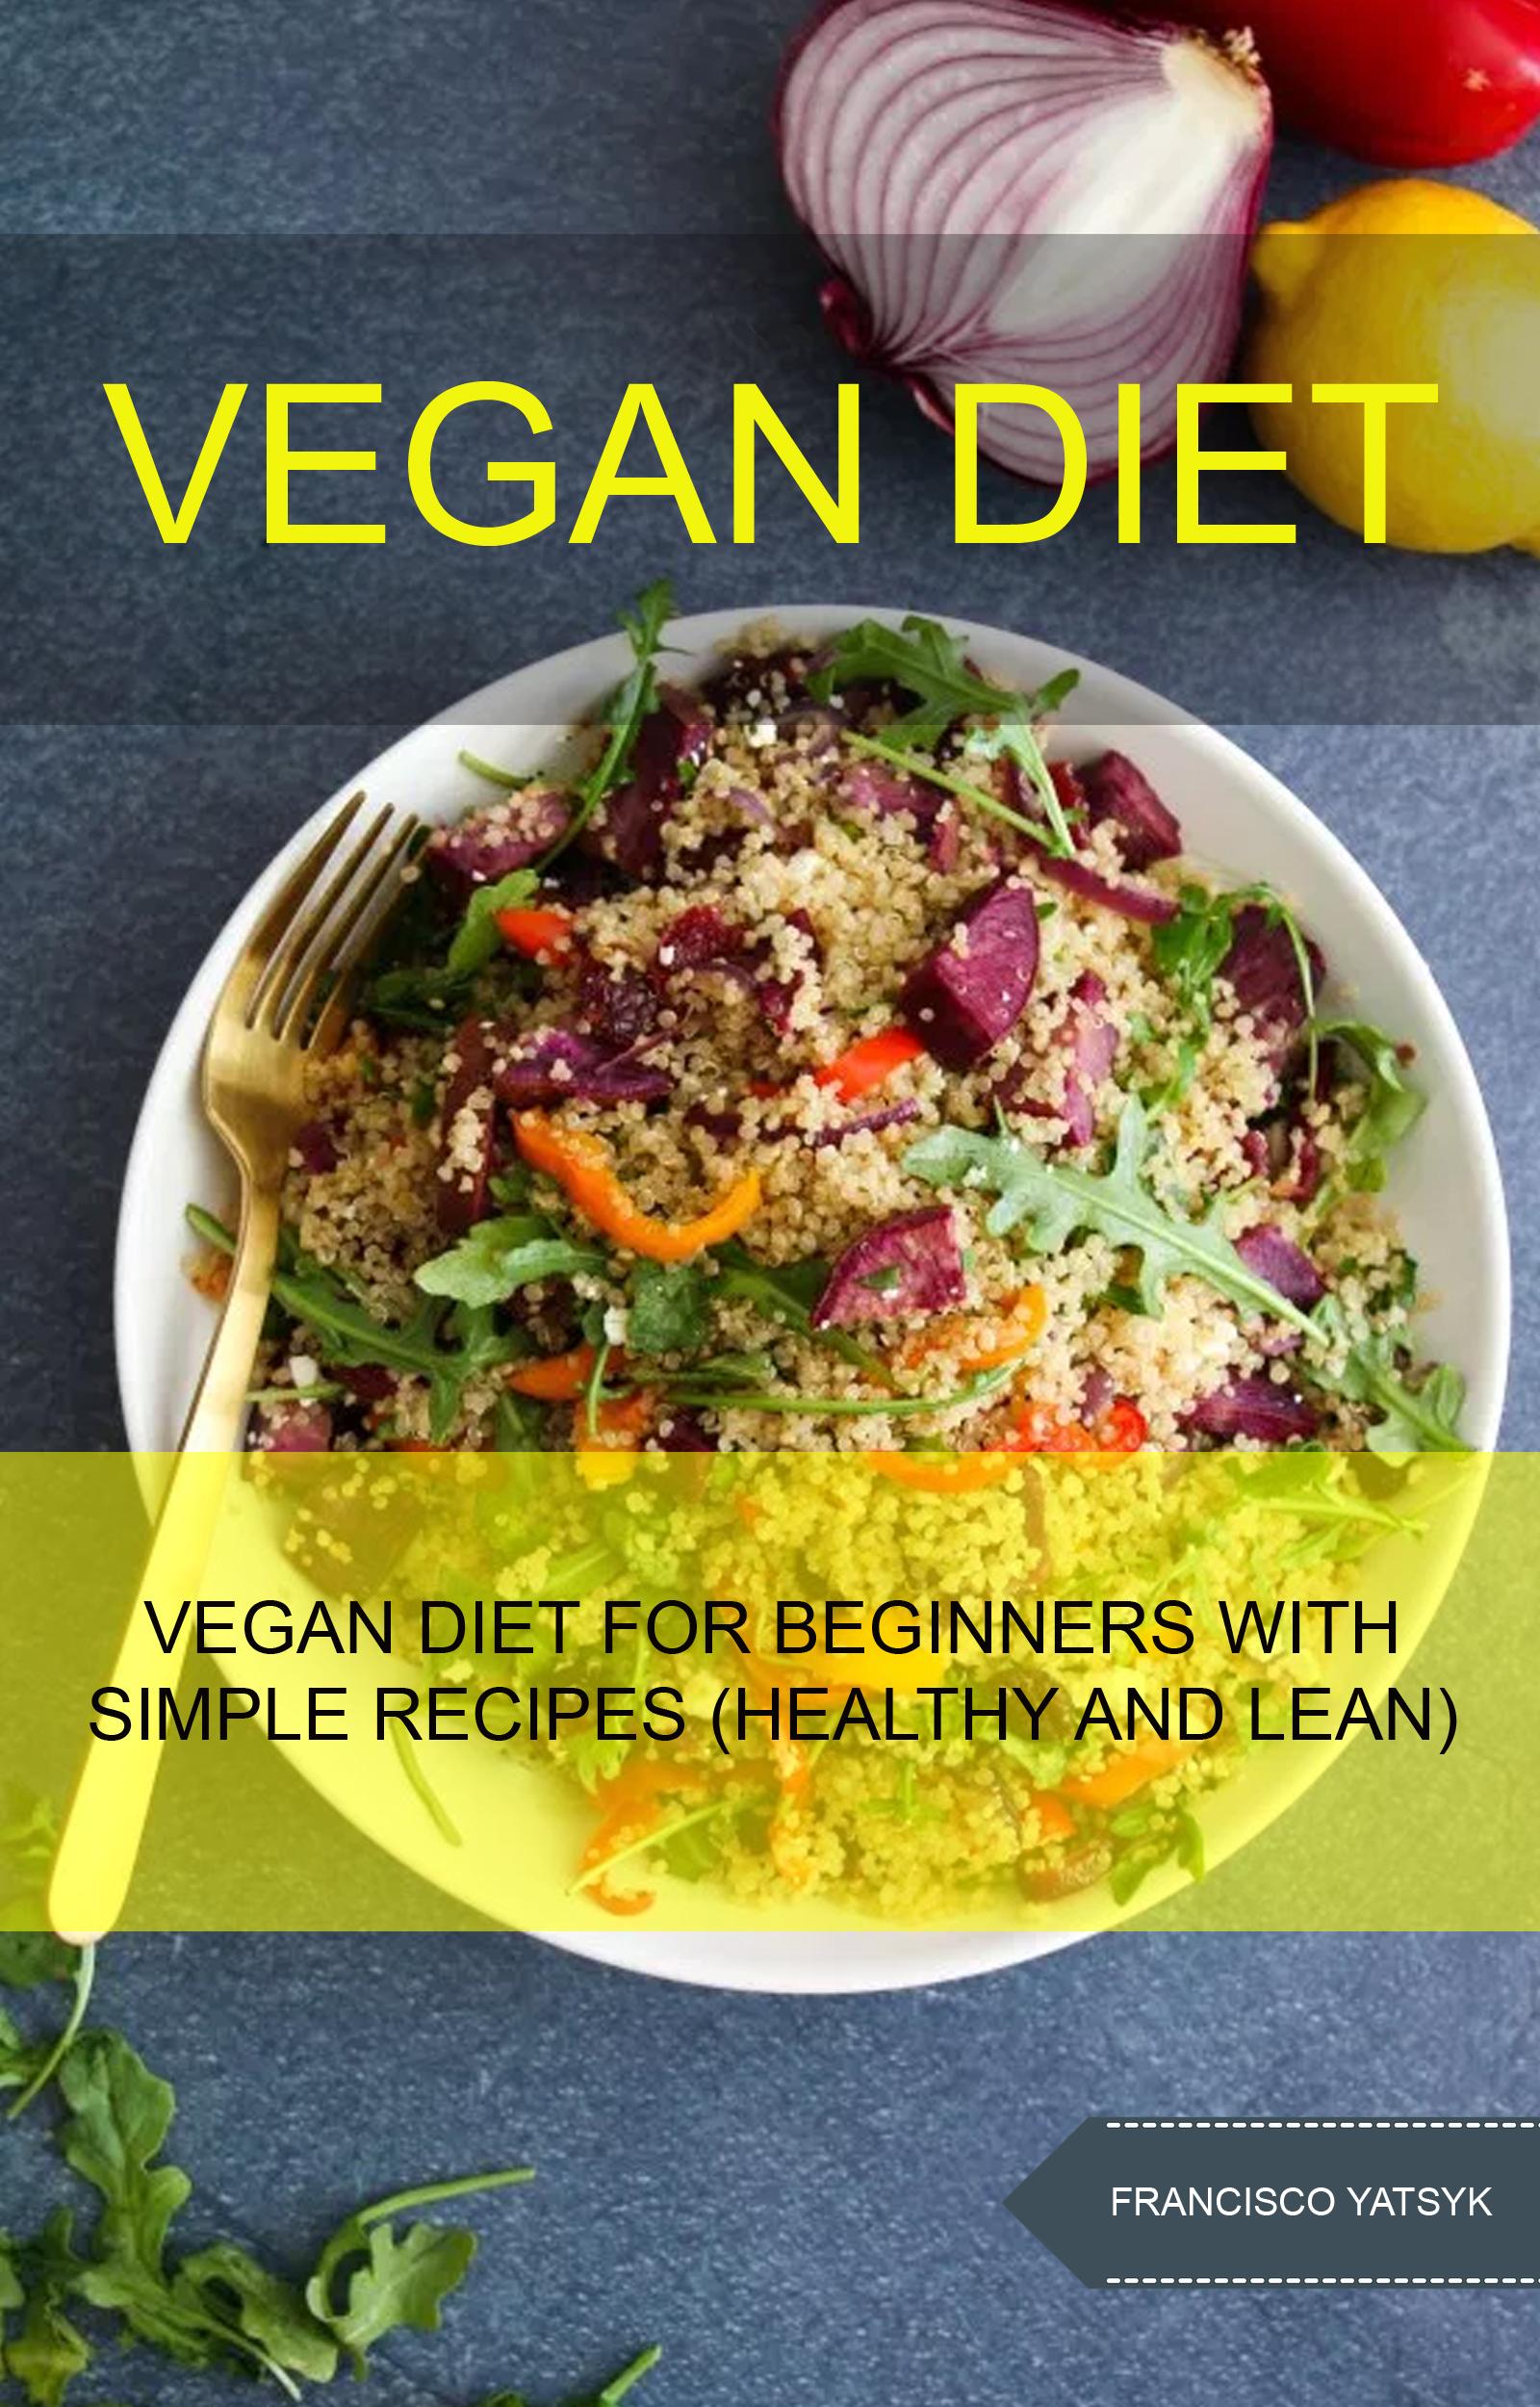 Vegan diet: vegan diet for beginners with simple recipes (healthy and lean)